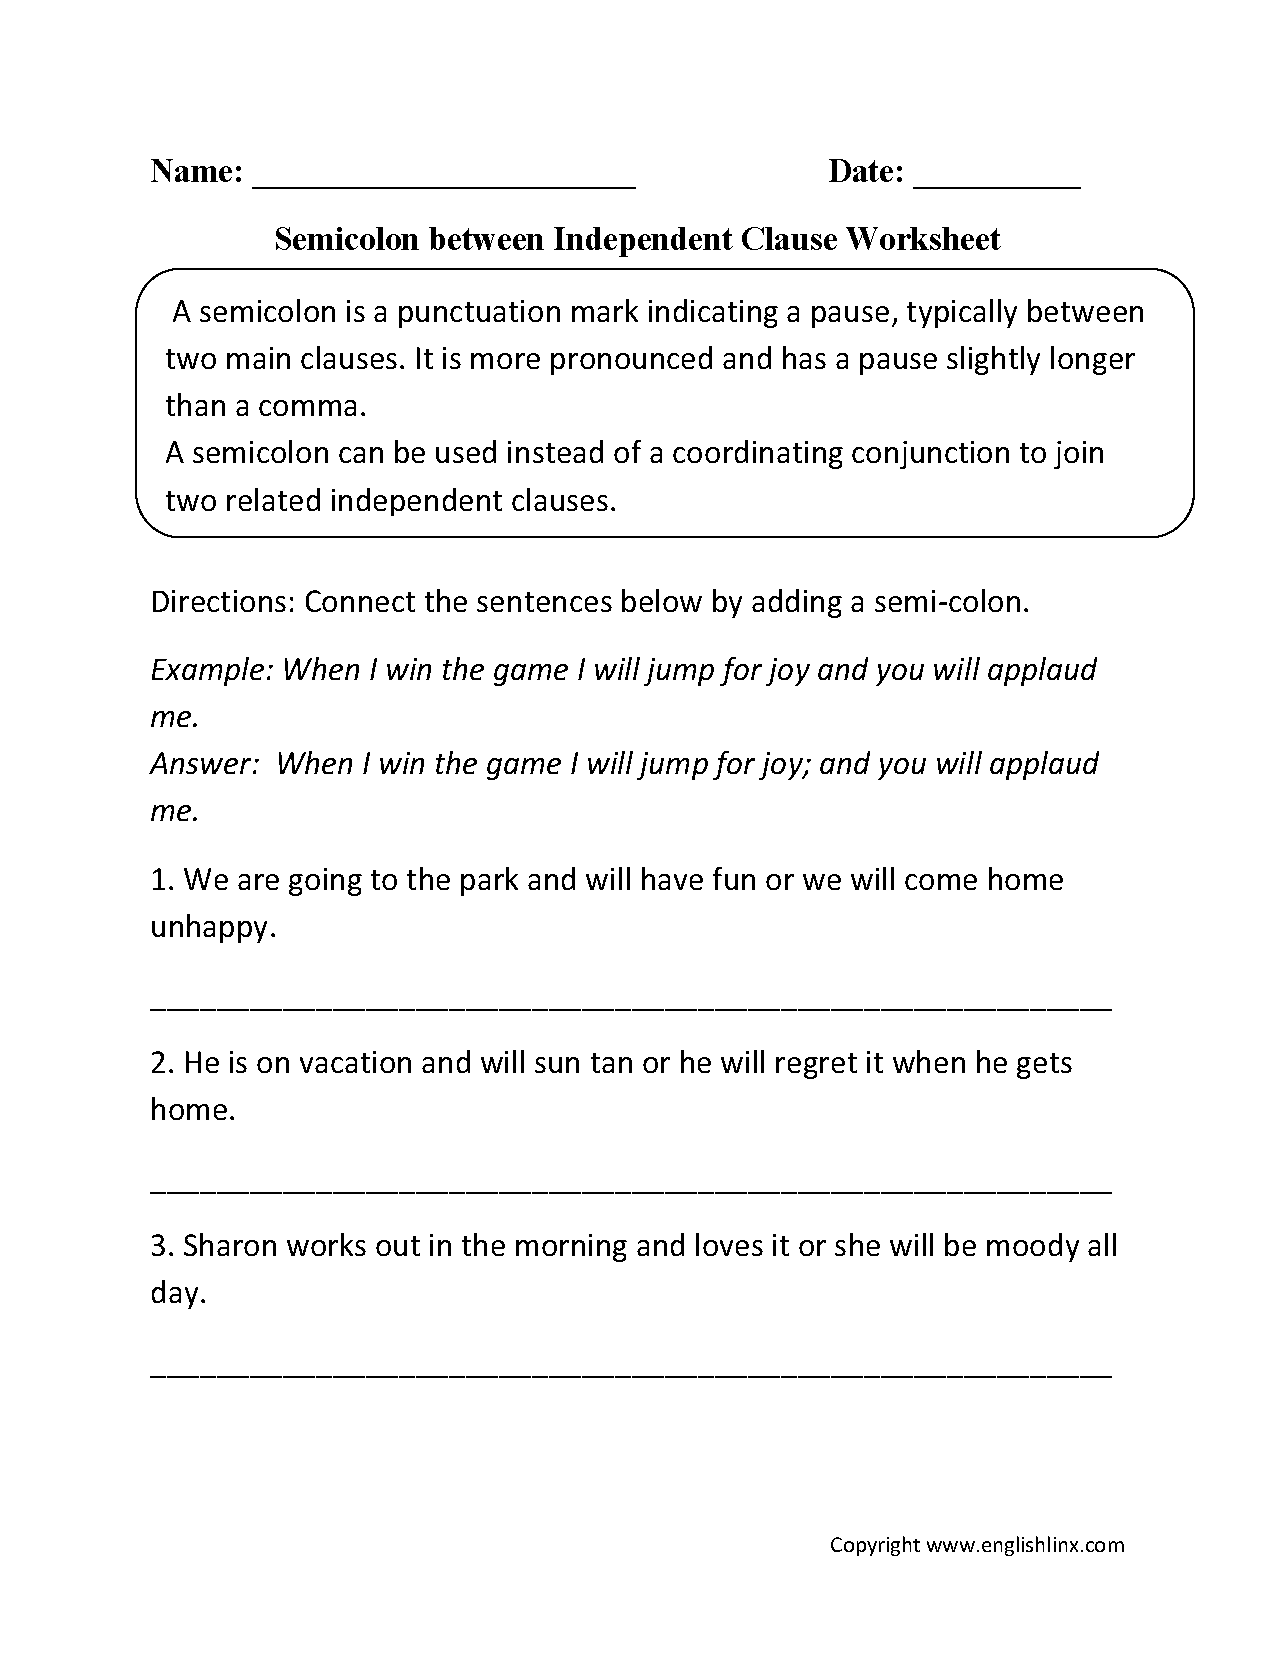 Punctuation Worksheets | Semicolon Worksheets